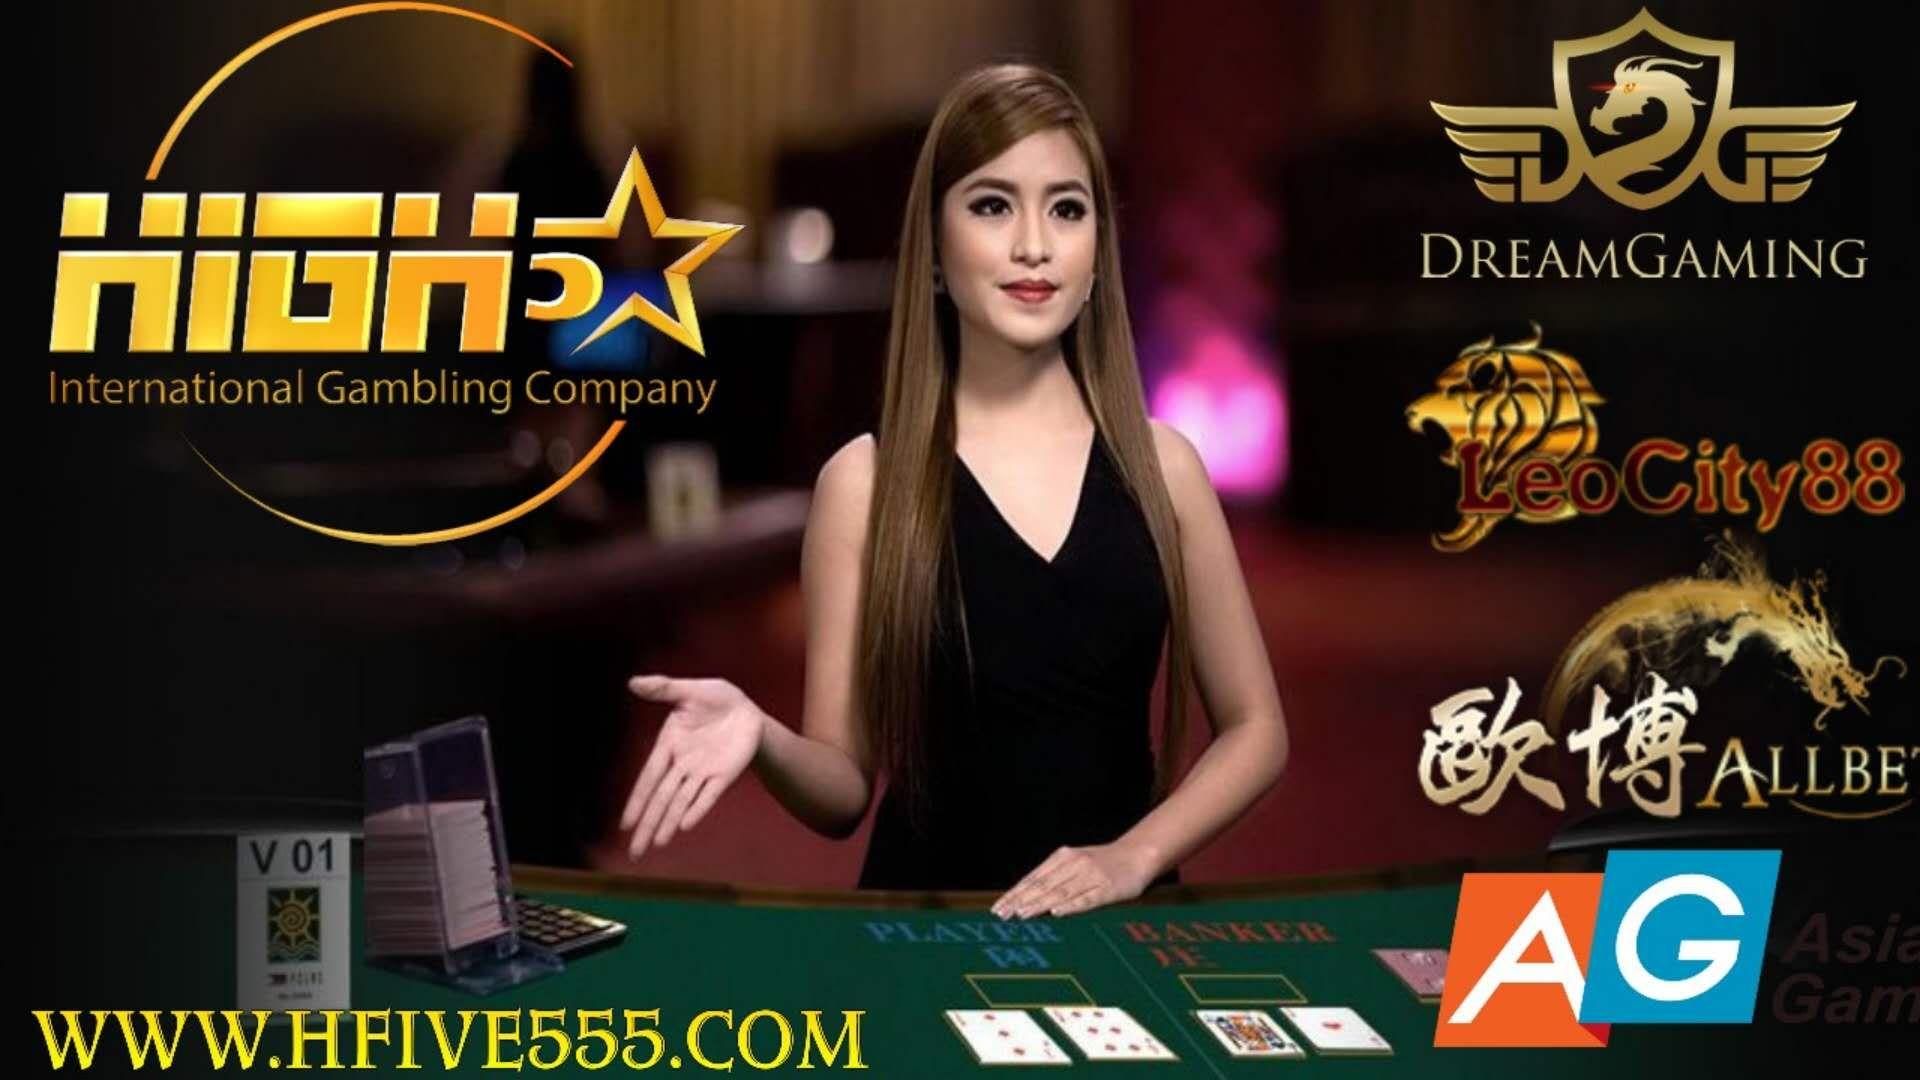 Casino age limit singapore iras